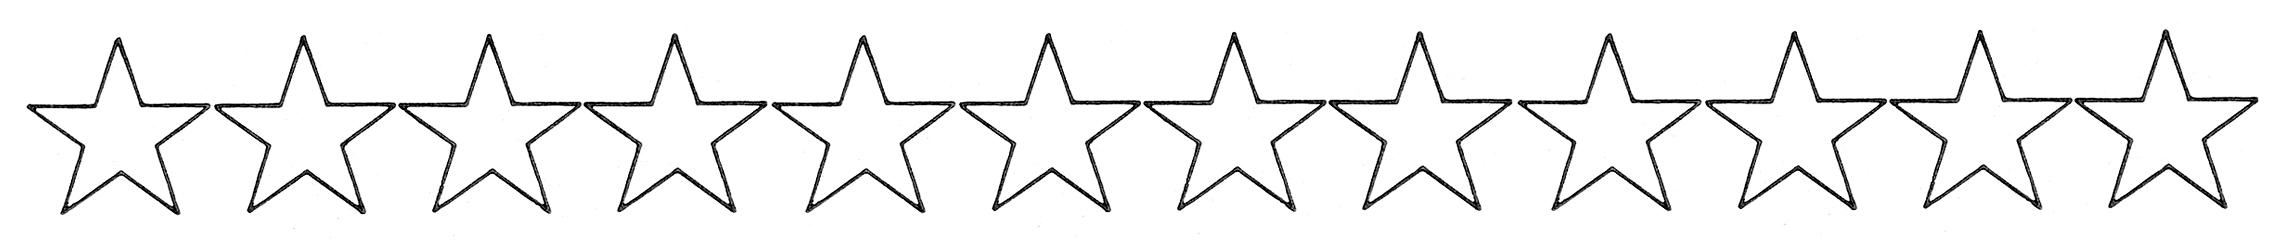 Different kinds of stars   Small star tattoos, Star tattoo designs, Star  tattoos